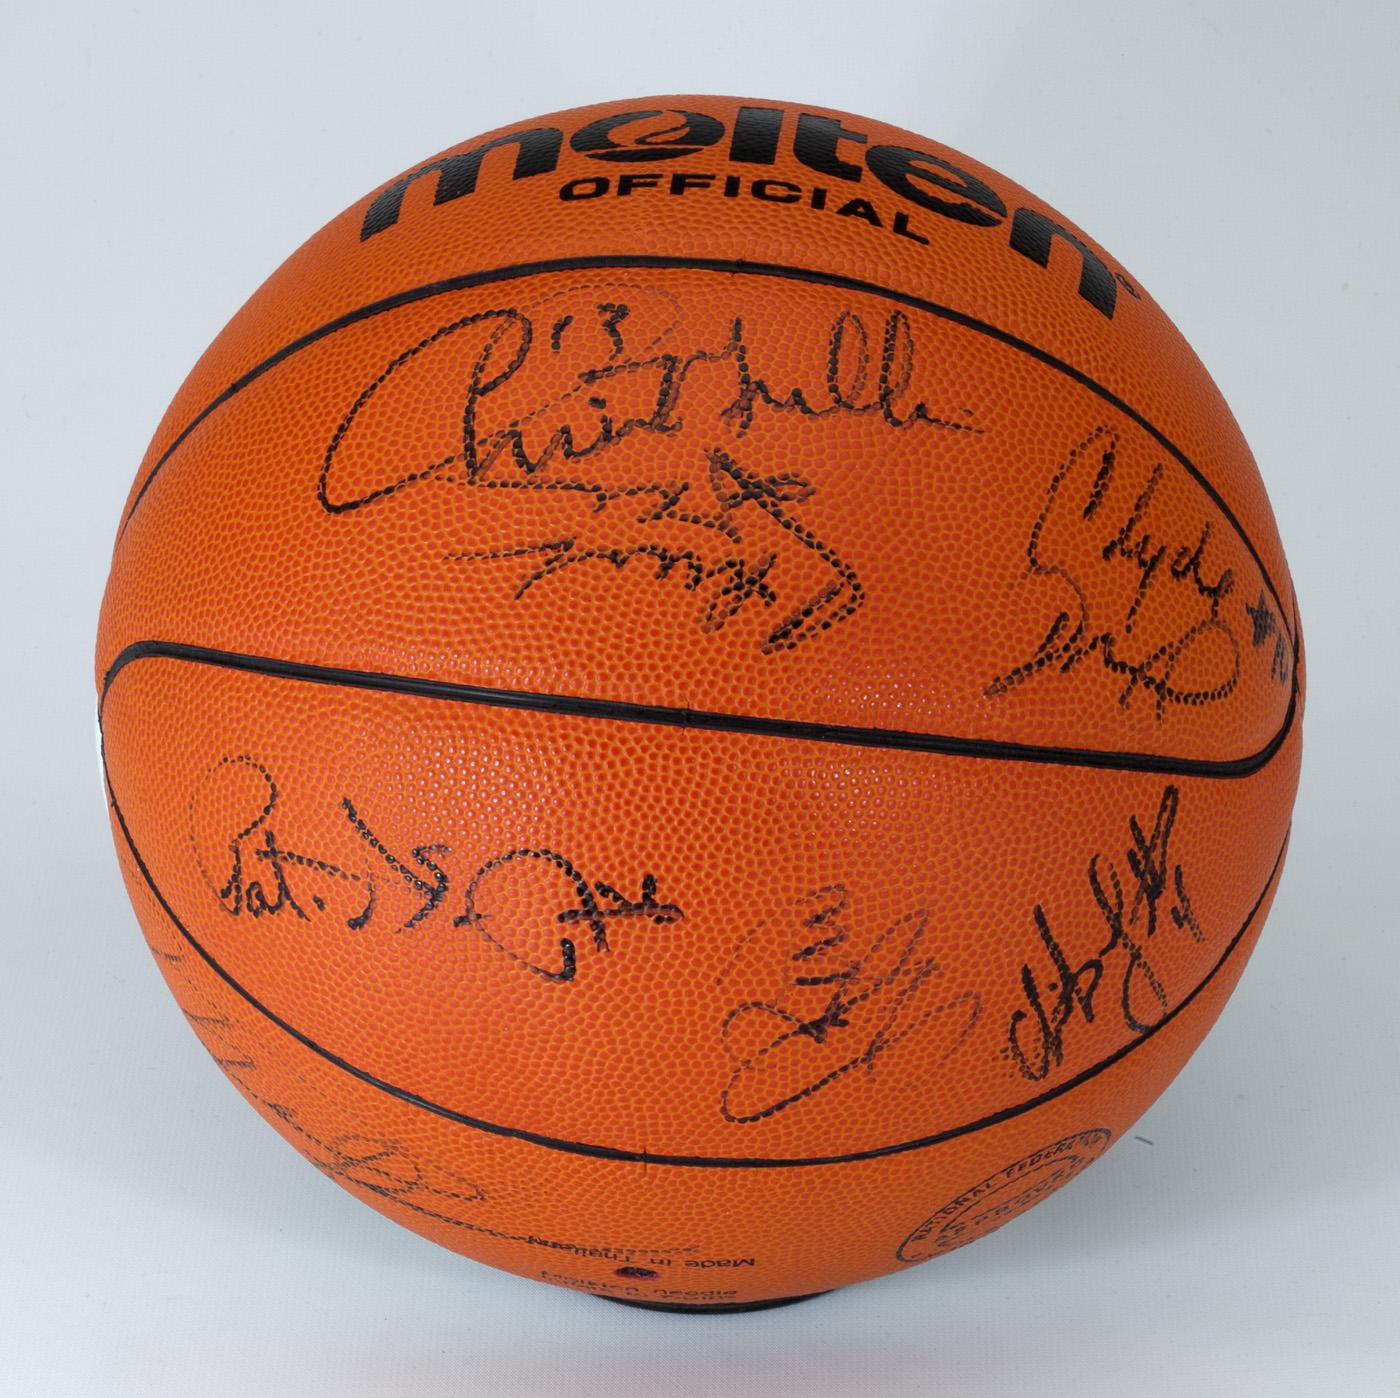 df34da2f1b61 Lot Detail - IMPORTANT 1992 U.S. MEN S BASKETBALL DREAM TEAM SIGNED ...